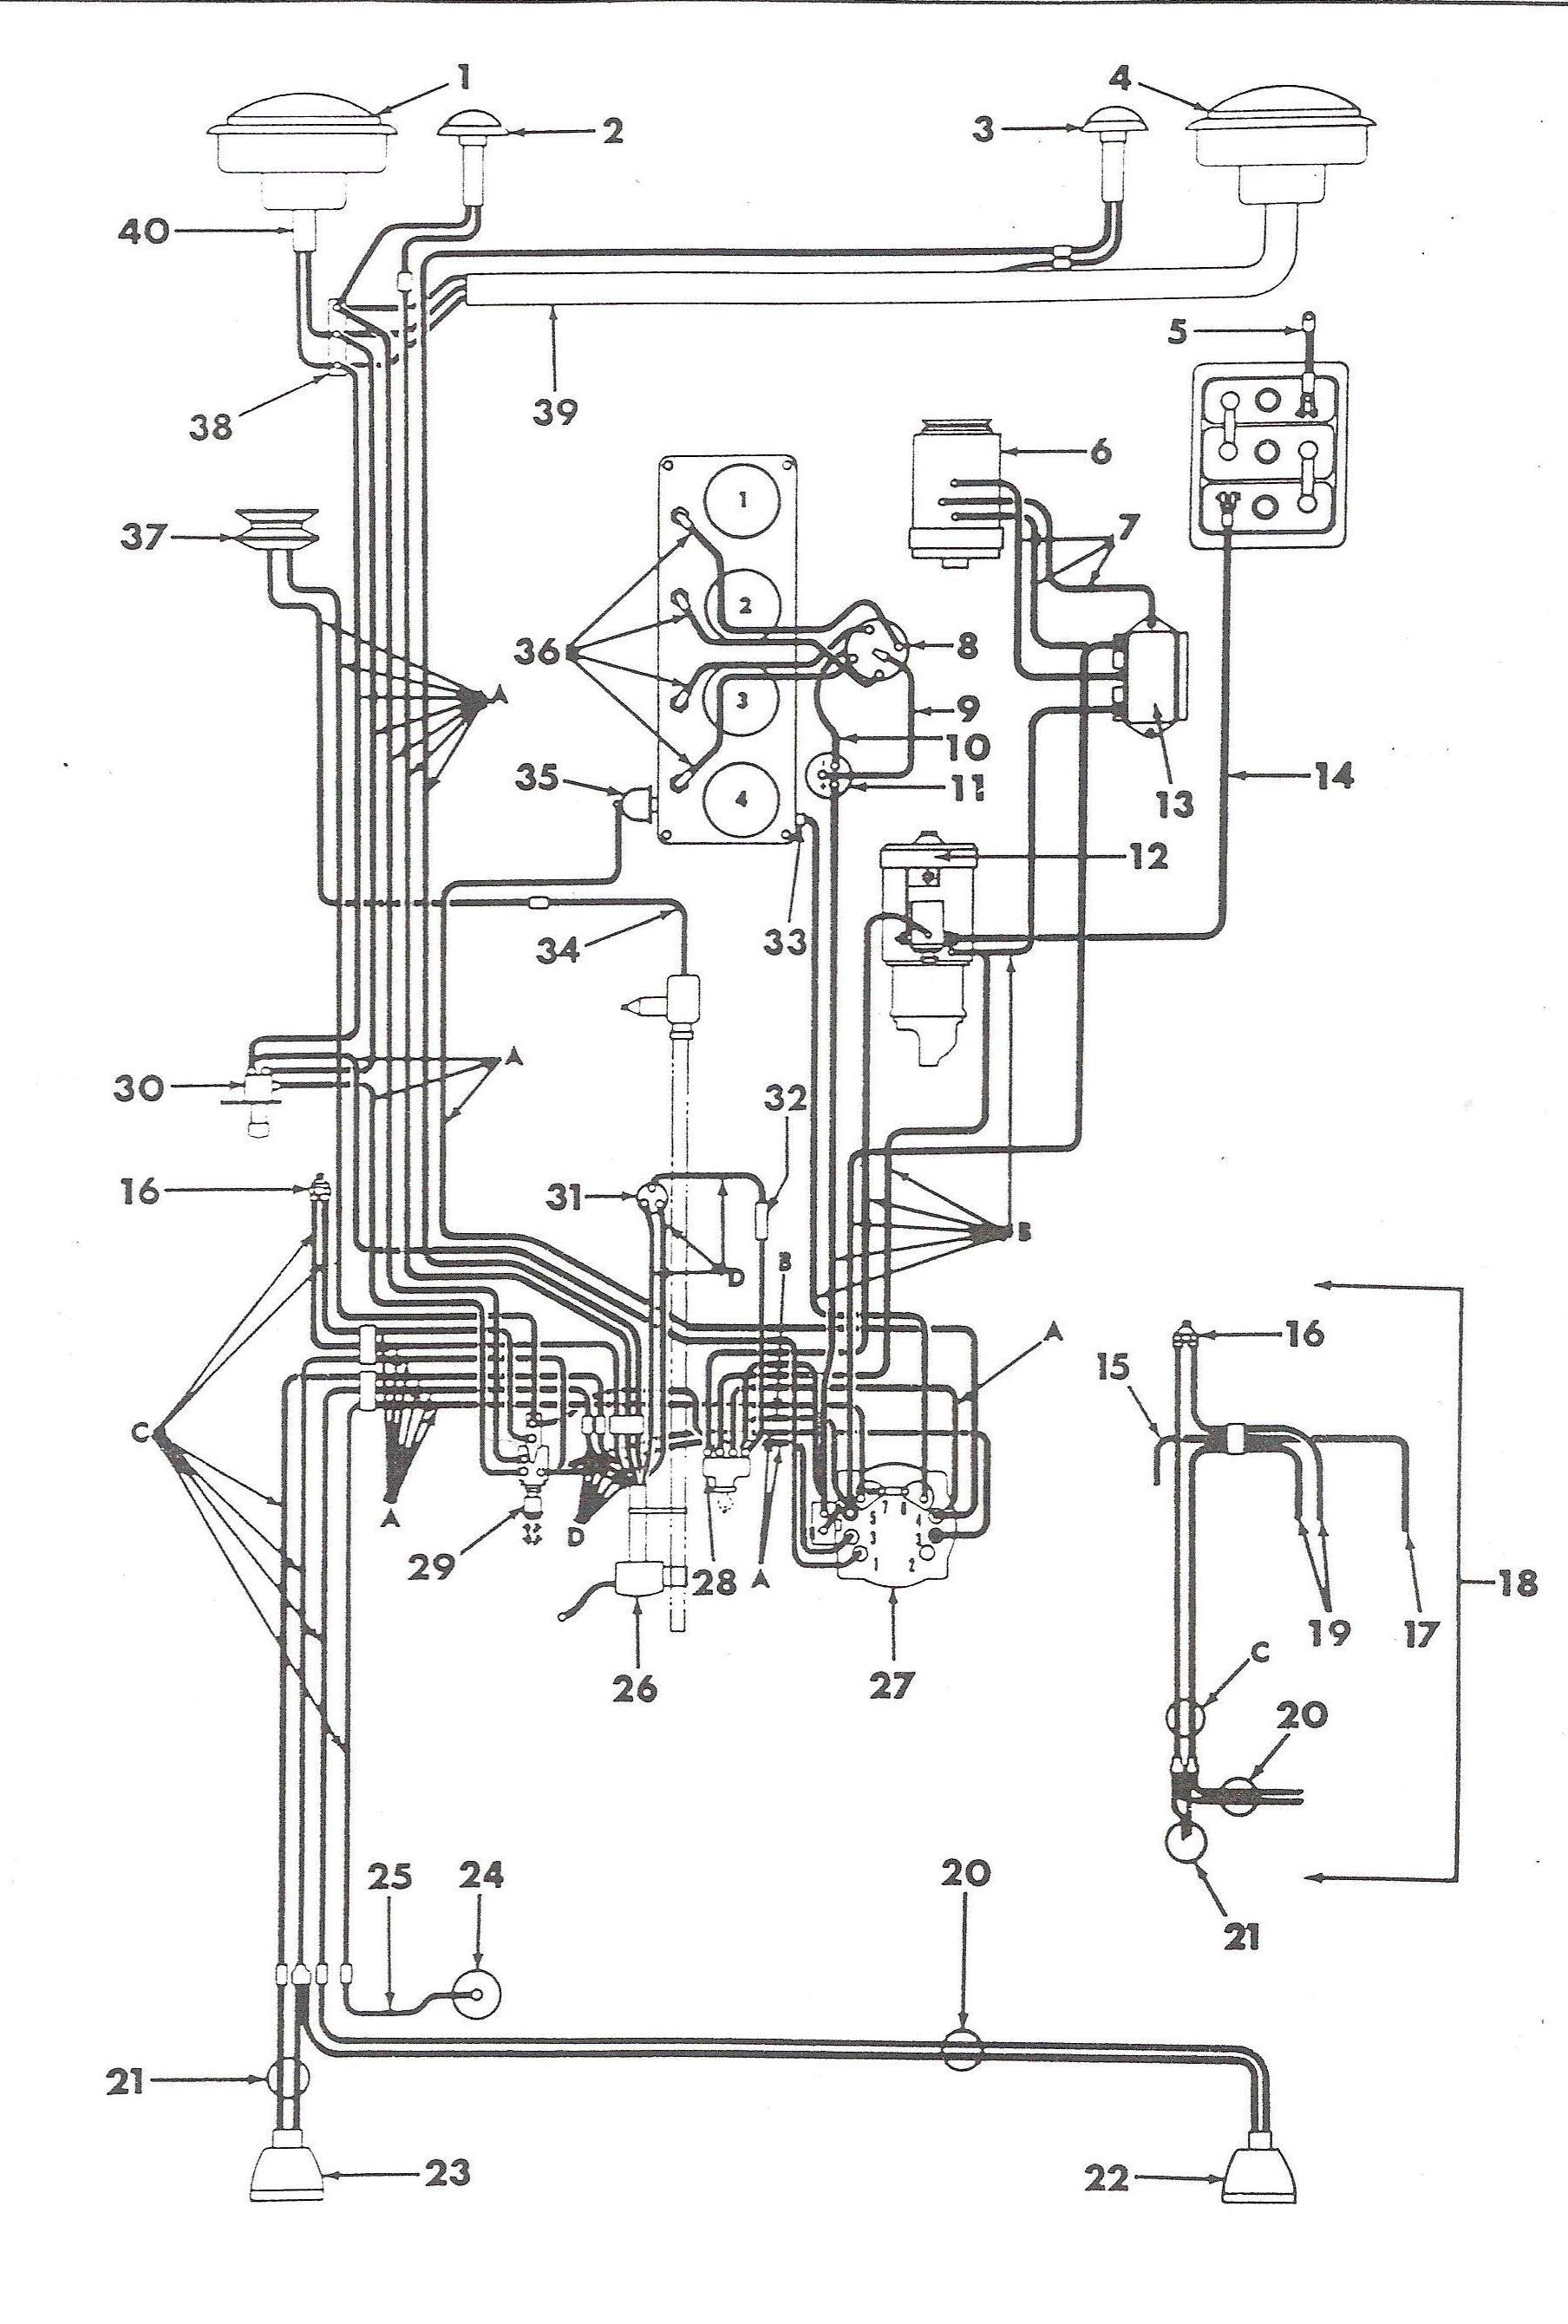 Willys Jeep Wiring Diagram For 1957 - Nordyne Air Handler Wiring Diagrams -  ad6e6.2005vtx.jeanjaures37.fr | Willys Jeep Wiring Diagram For 1957 |  | Wiring Diagram Resource